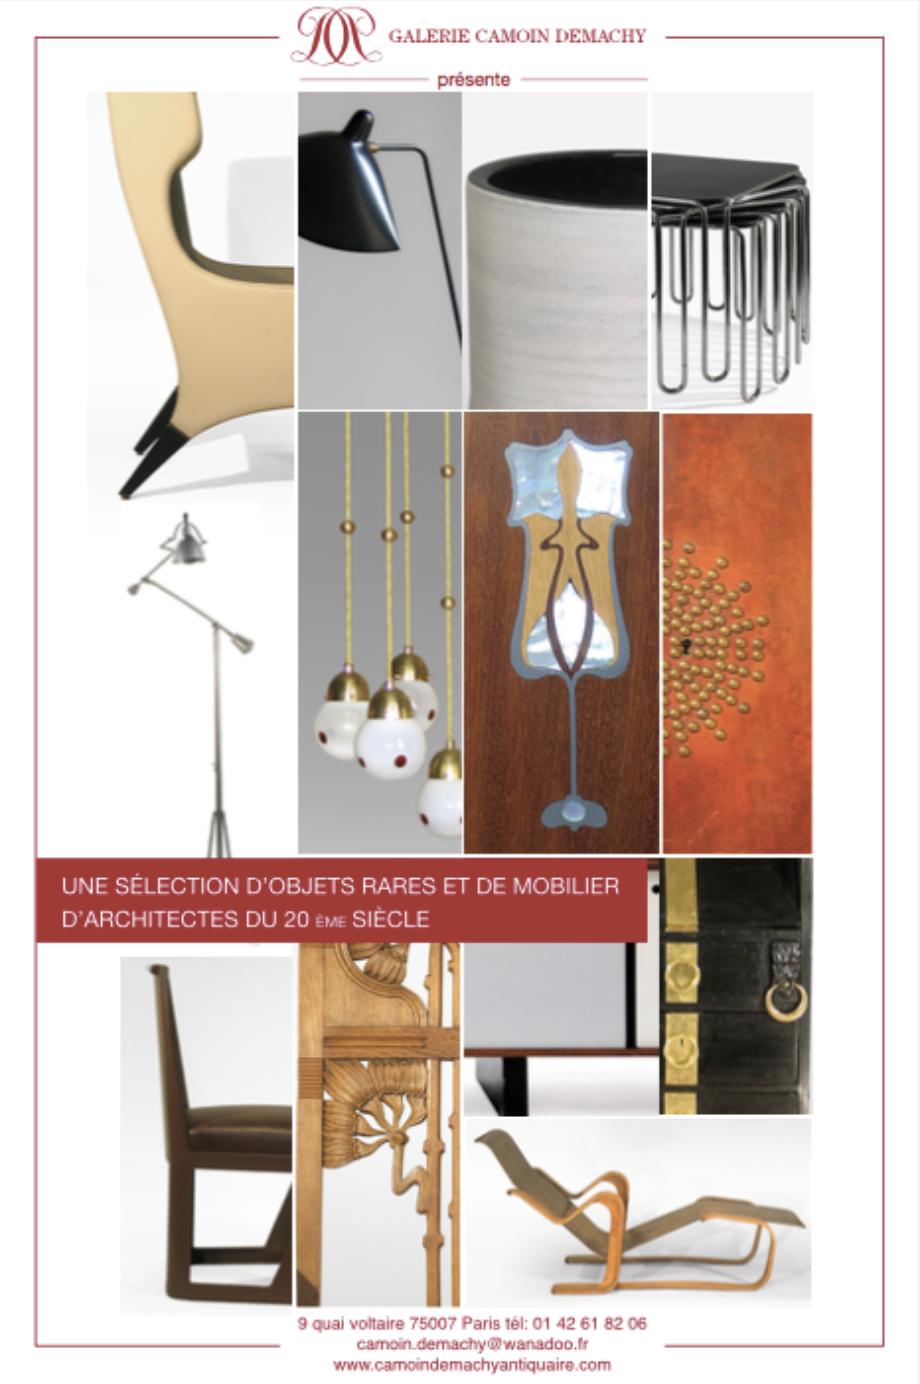 Expo-Galerie-Demachy-2012-Galerie-Avenir